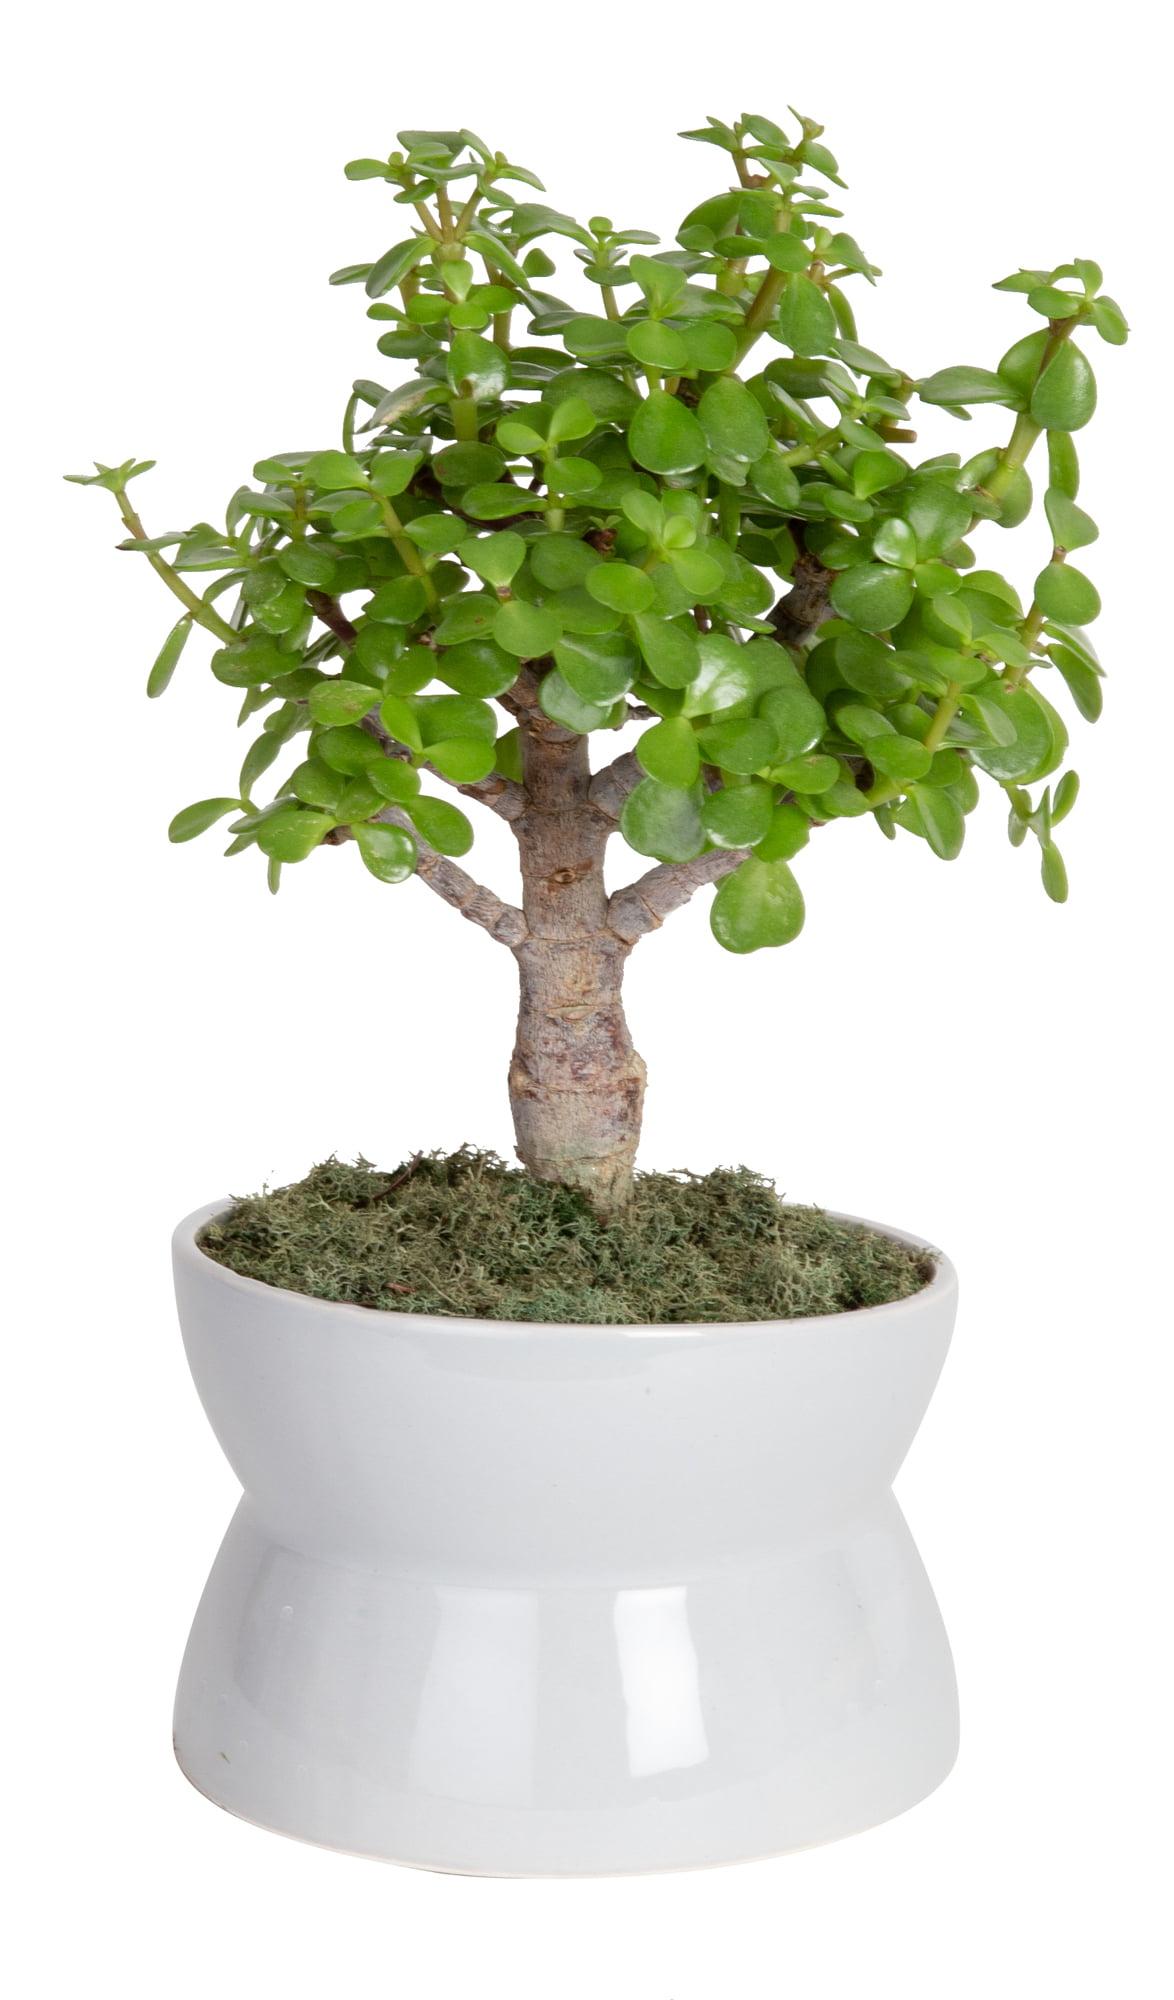 Better Homes Gardens Live Indoor 15in Tall Green Bonsai Plant Partial Sun In 6in Ceramic Planter Walmart Com Walmart Com